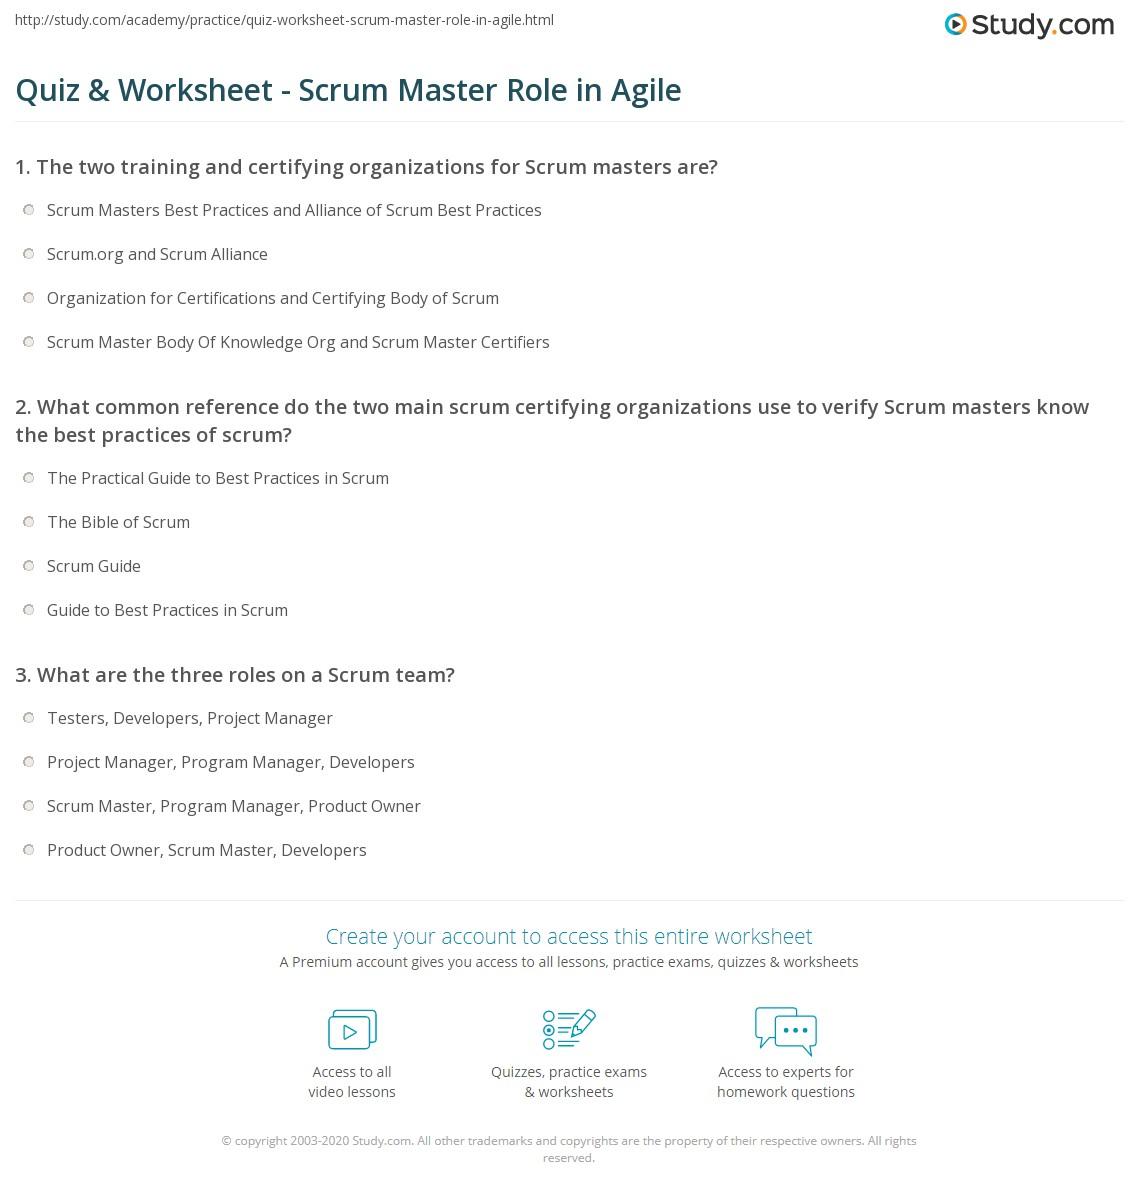 Quiz & Worksheet - Scrum Master Role In Agile